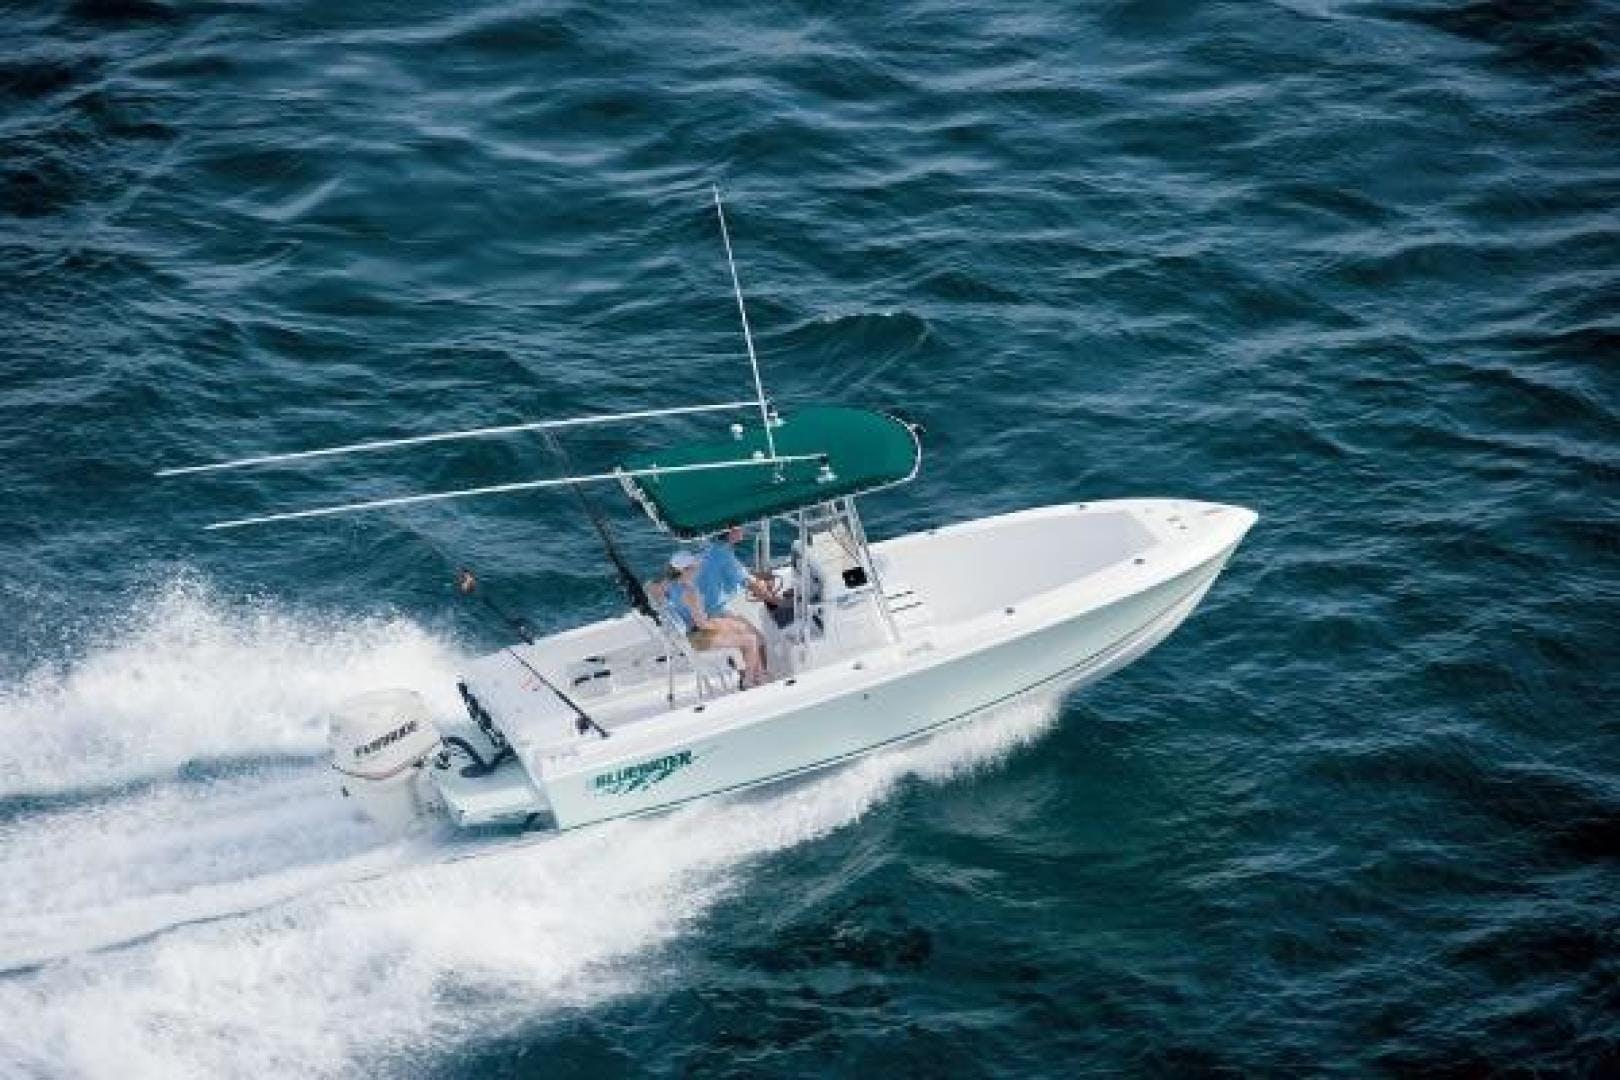 2020 Bluewater Sportfishing 22' 2150 Bluewater Sportfishing 2150 | Picture 2 of 4